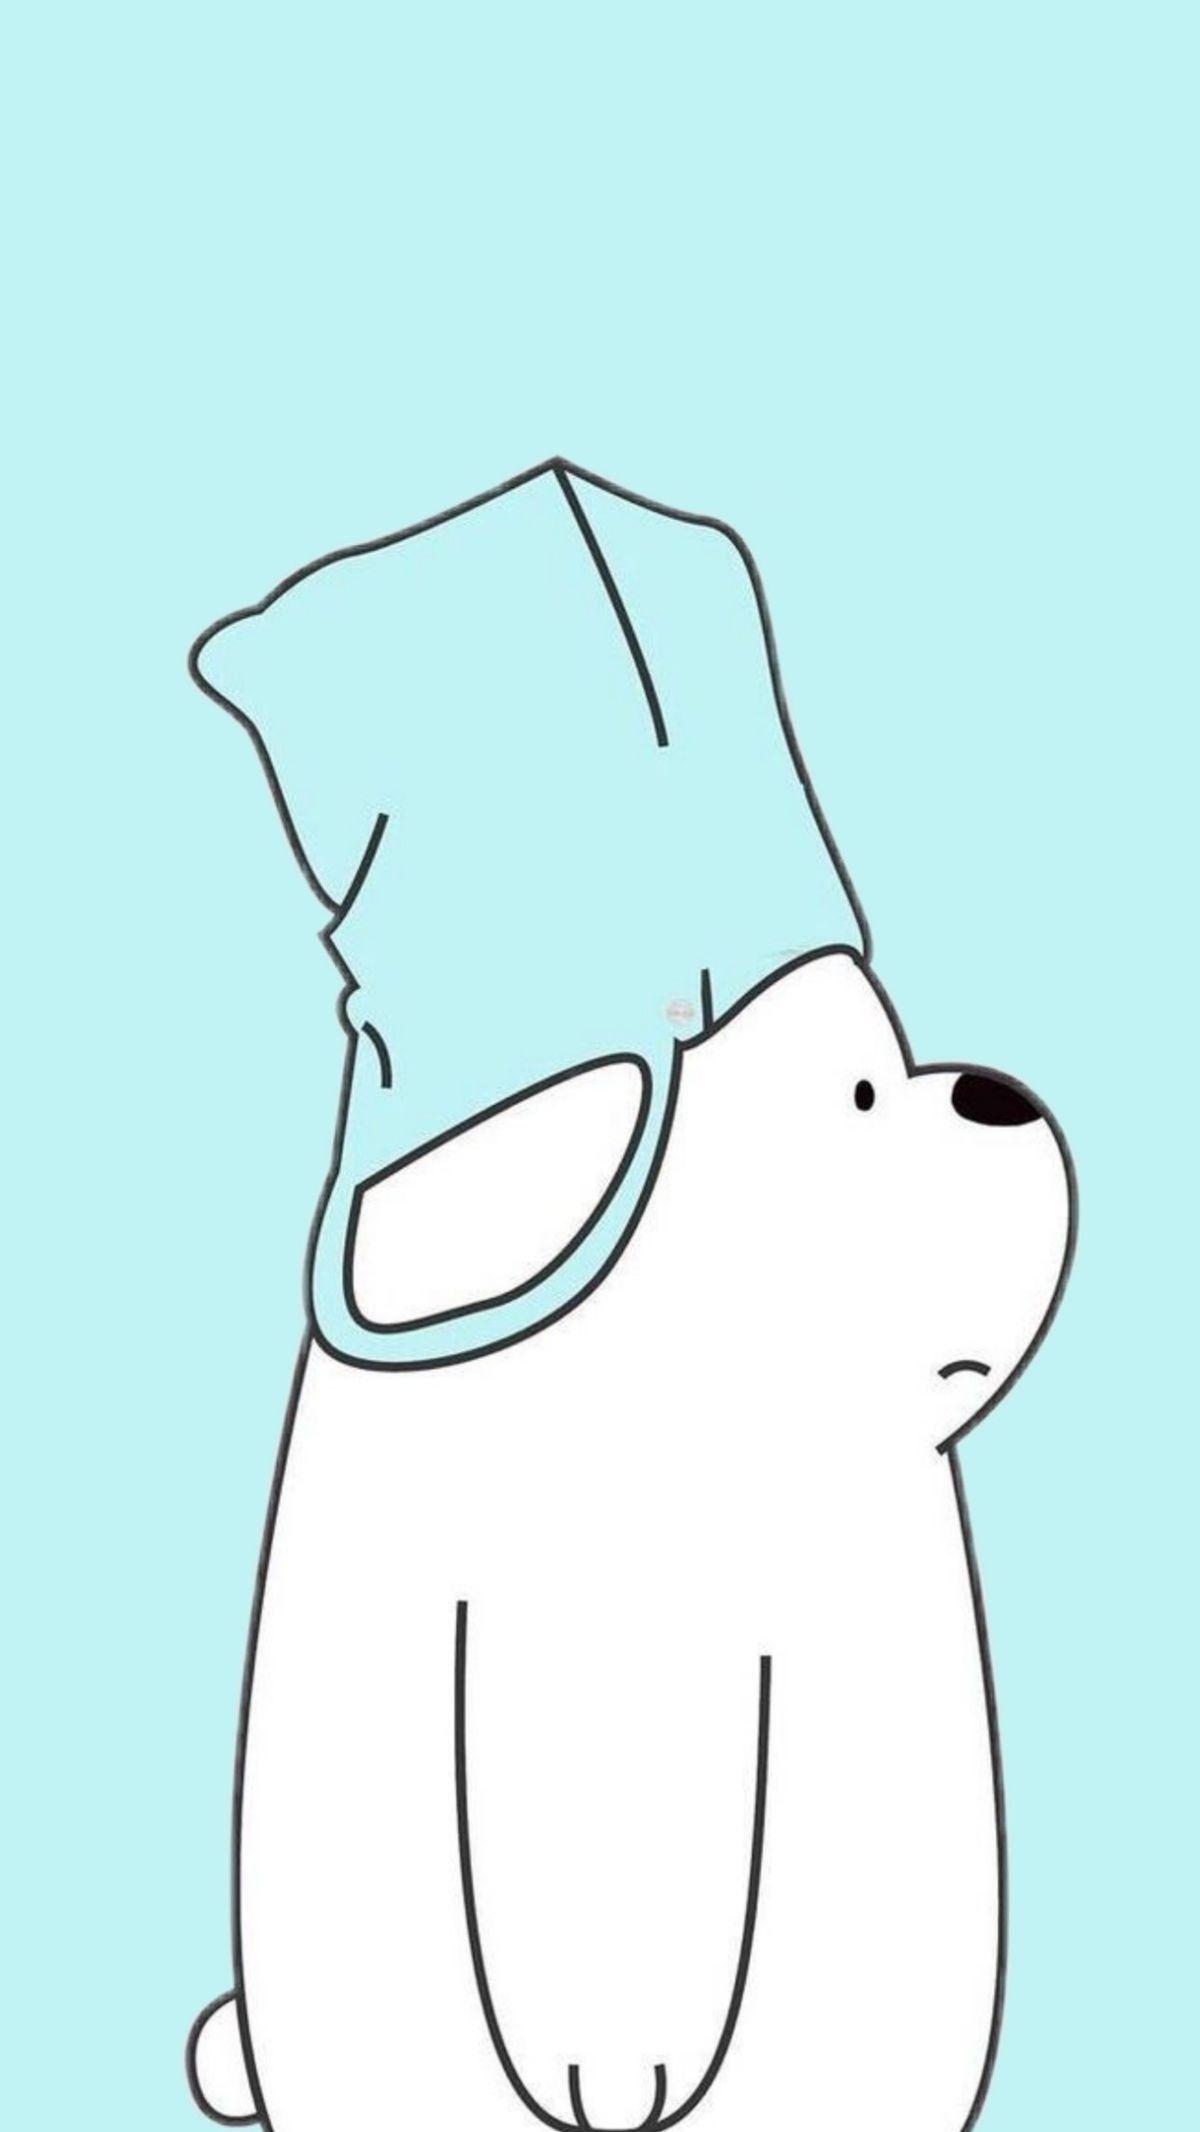 Ecological Bag We Bare Bears Wallpapers Bear Wallpaper Ice Bear We Bare Bears